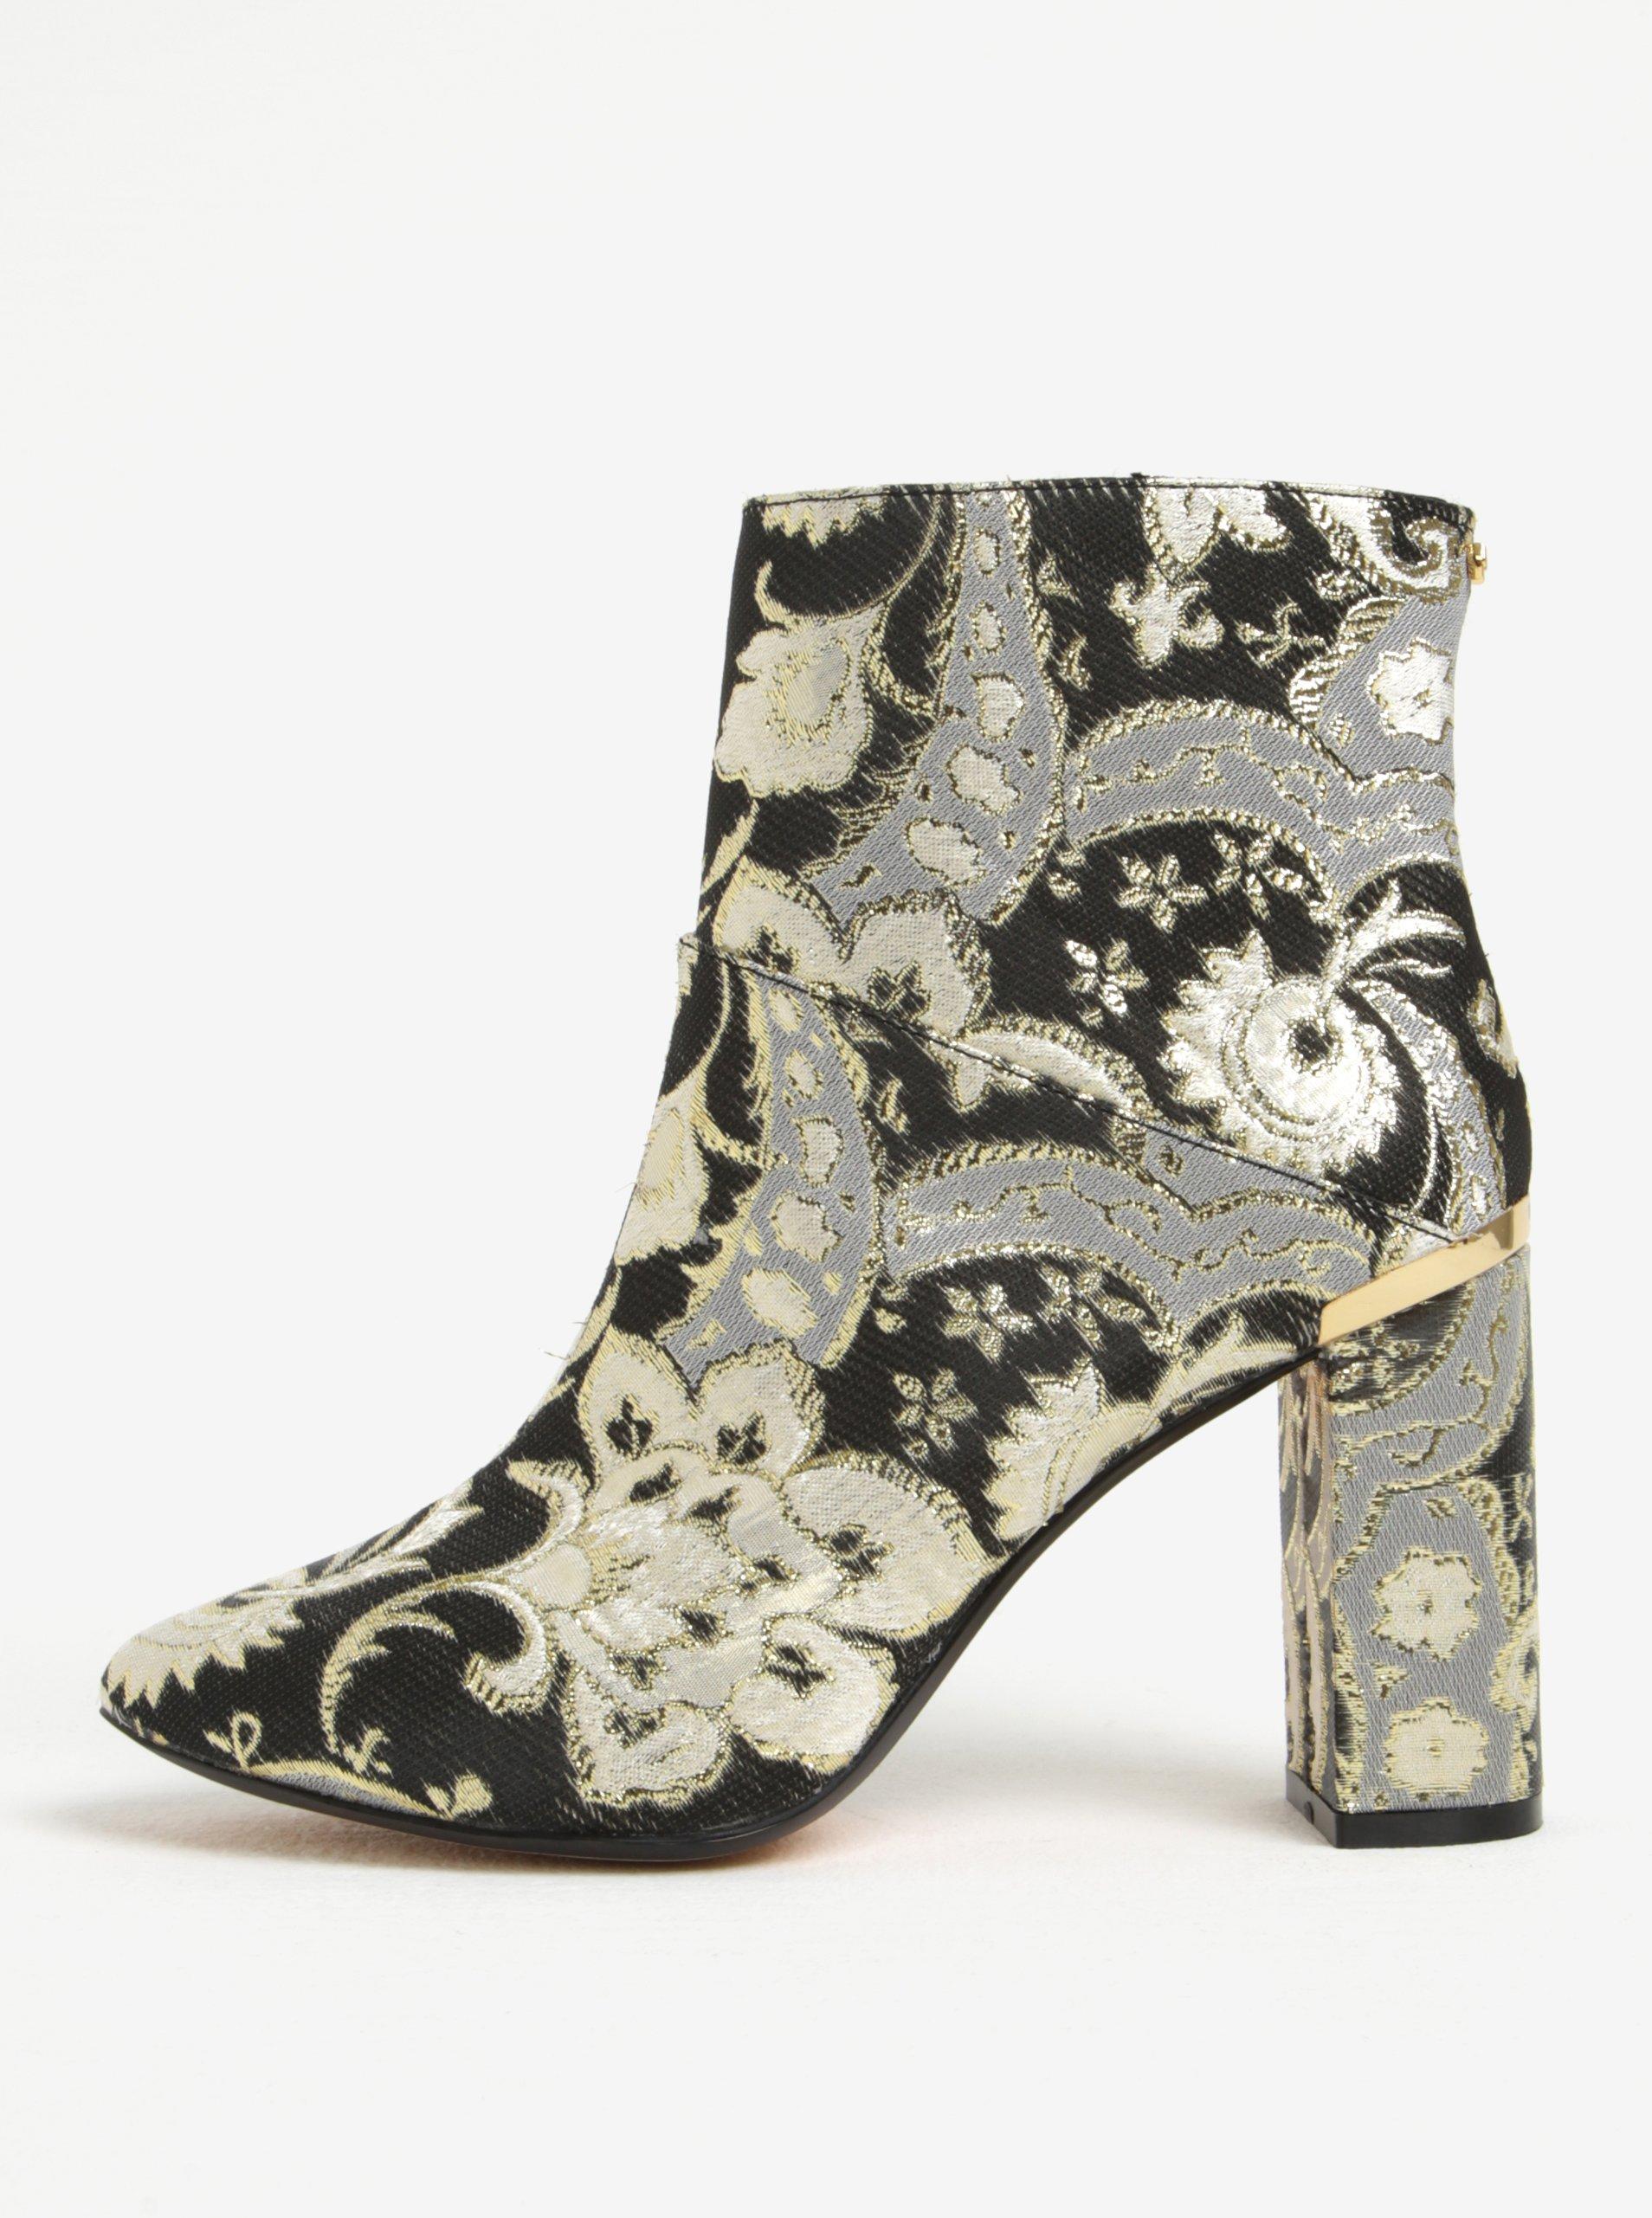 264dbbadf4 Zlato-čierne vzorované členkové topánky Ted Baker Ishbel